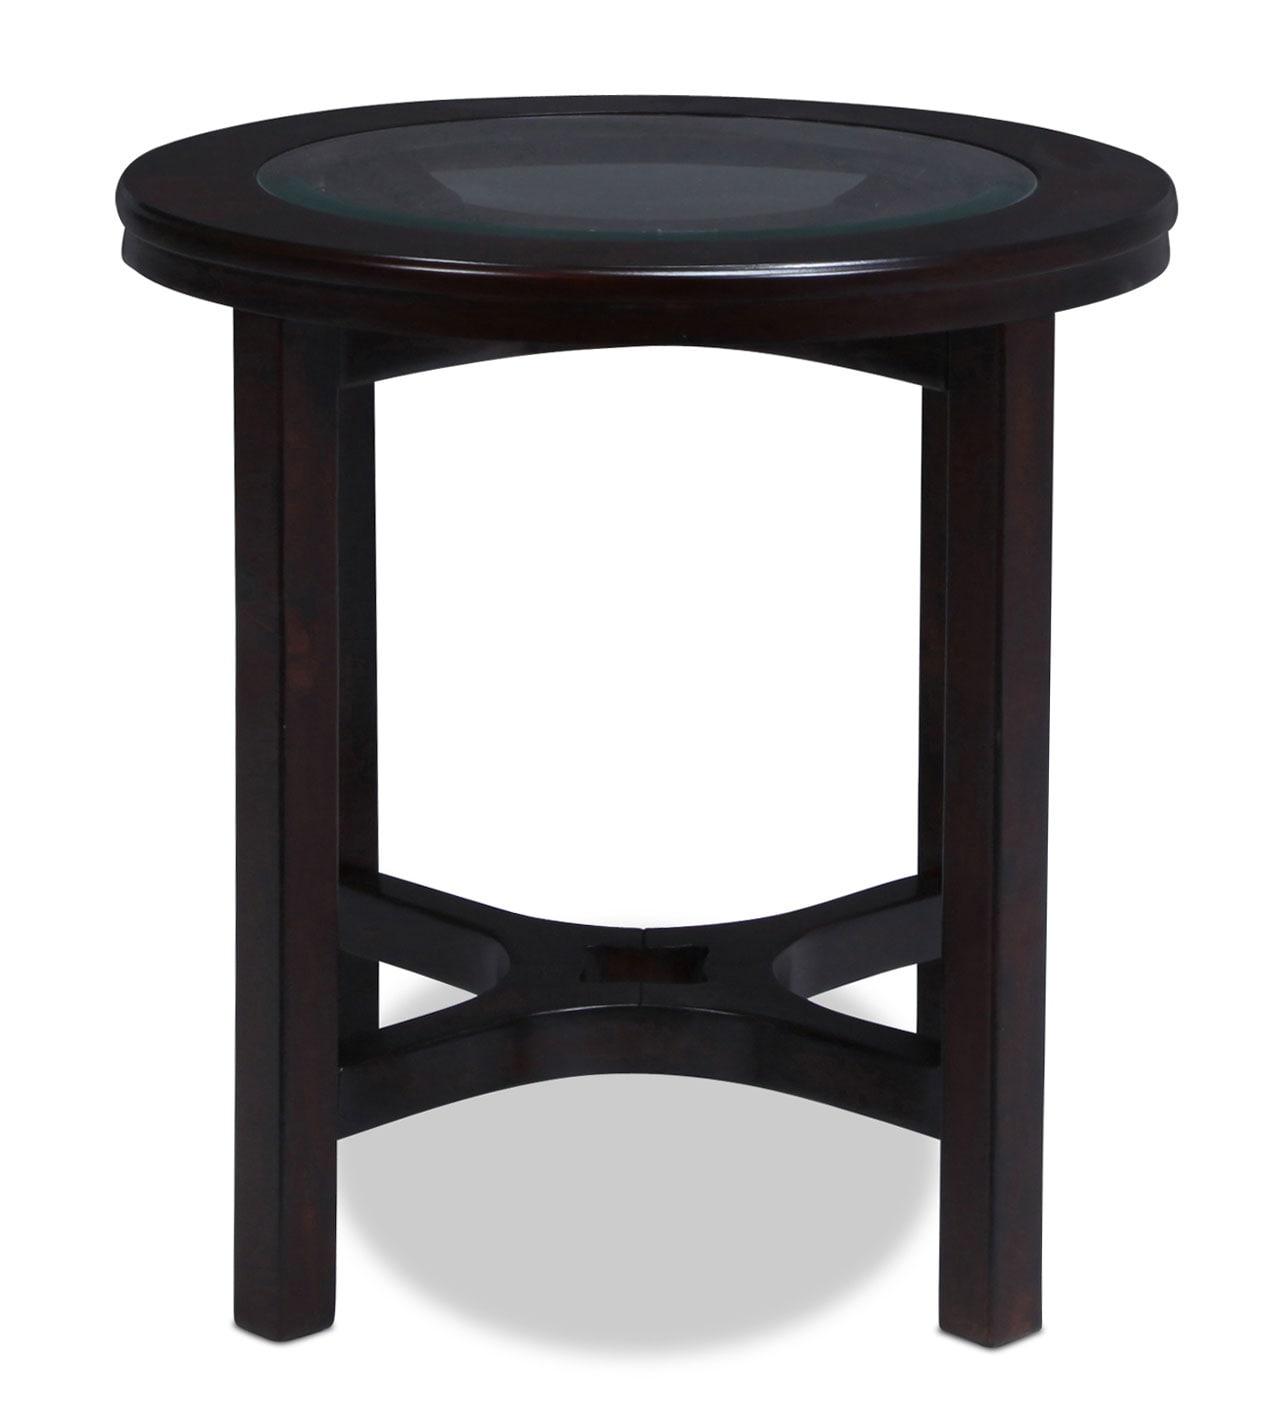 Seymour End Table - Espresso